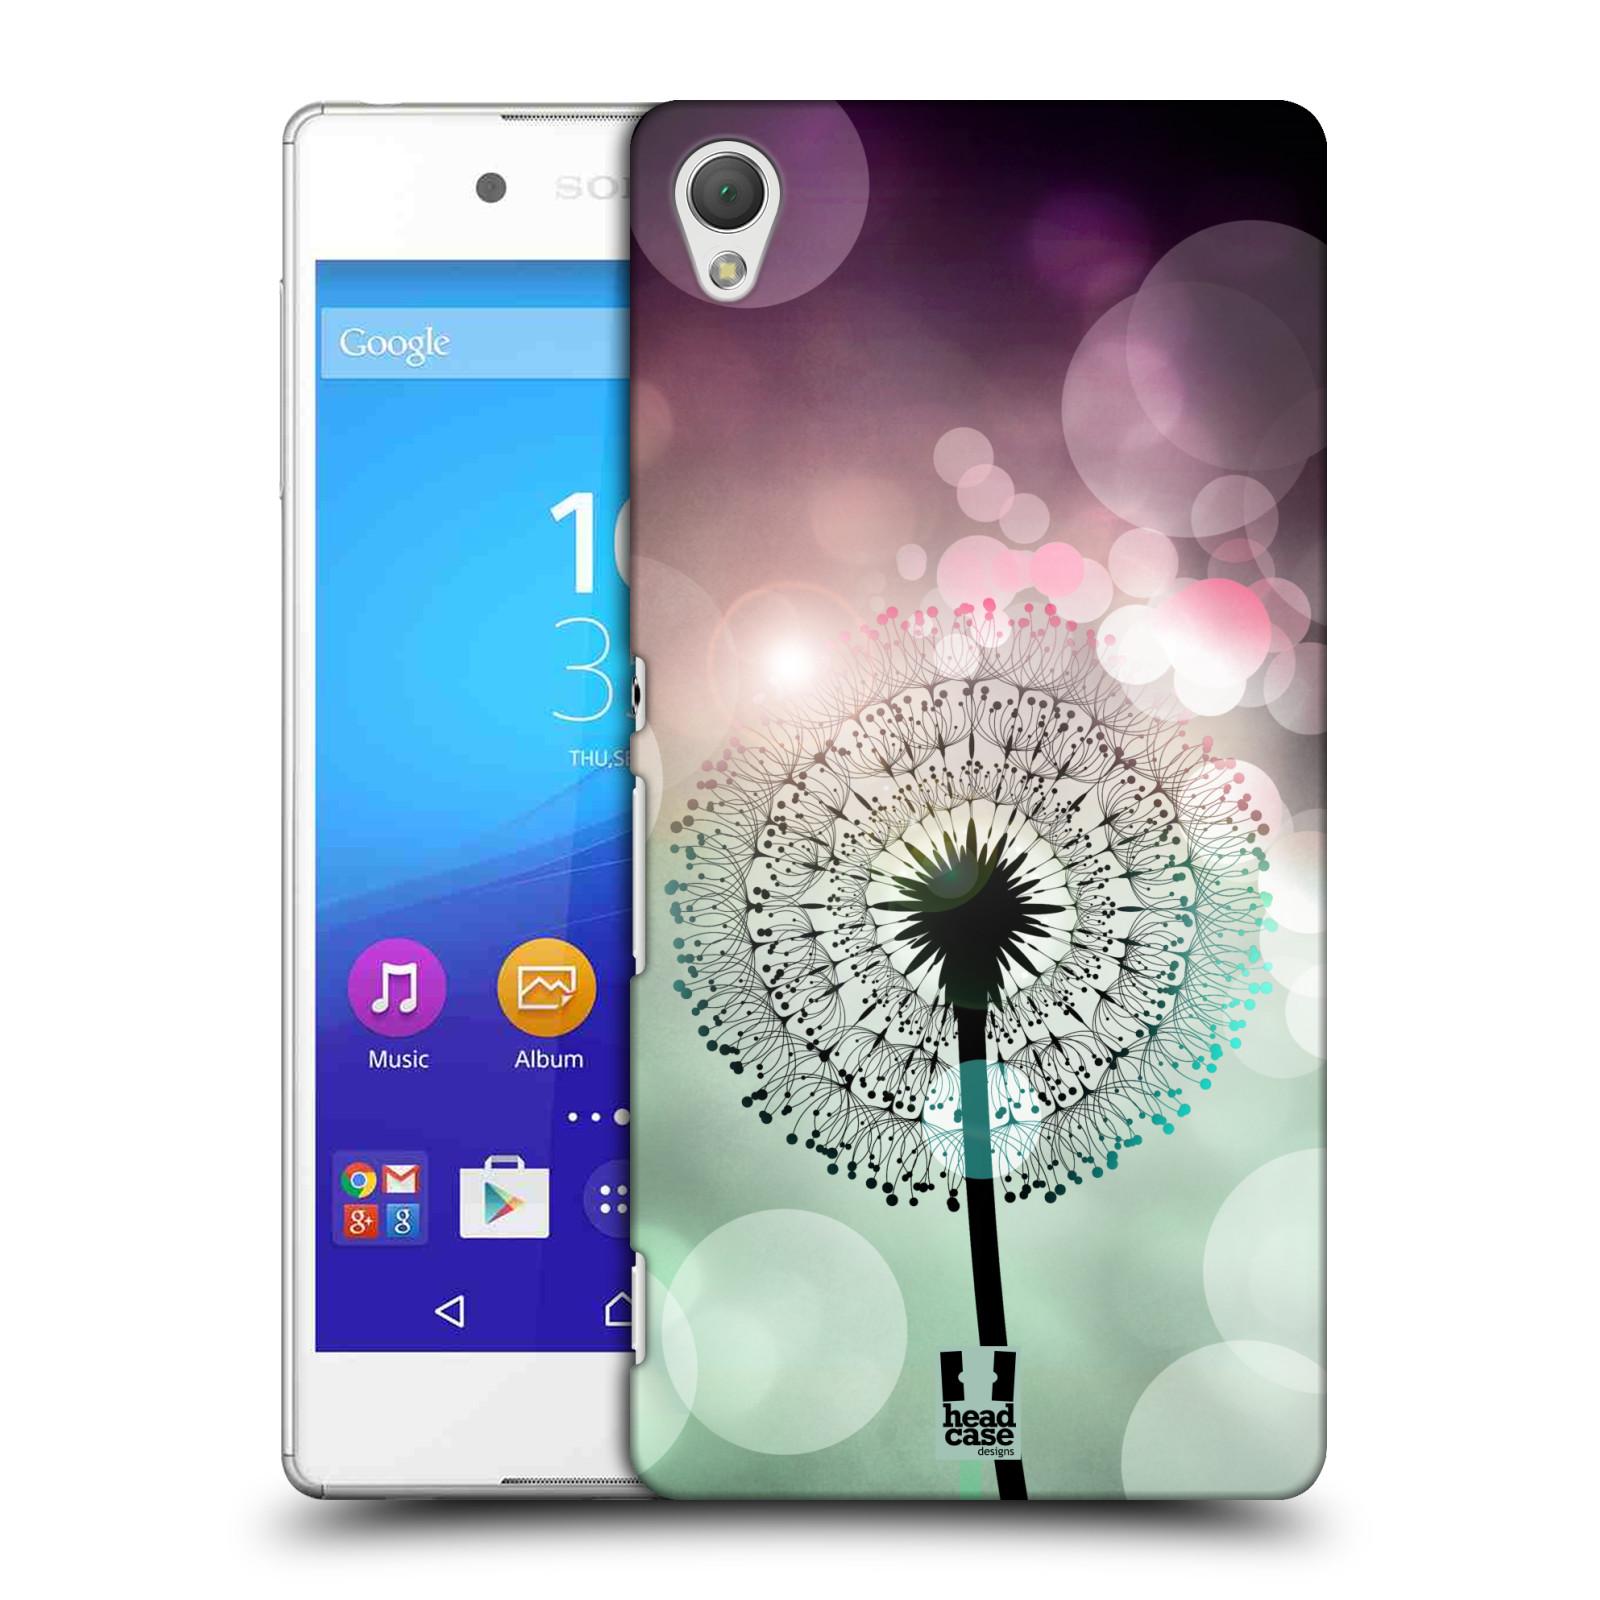 Plastové pouzdro na mobil Sony Xperia Z3+ (Plus) HEAD CASE Pampeliškové odlesky (Kryt či obal na mobilní telefon Sony Xperia Z3+ a Sony Xperia Z4 )